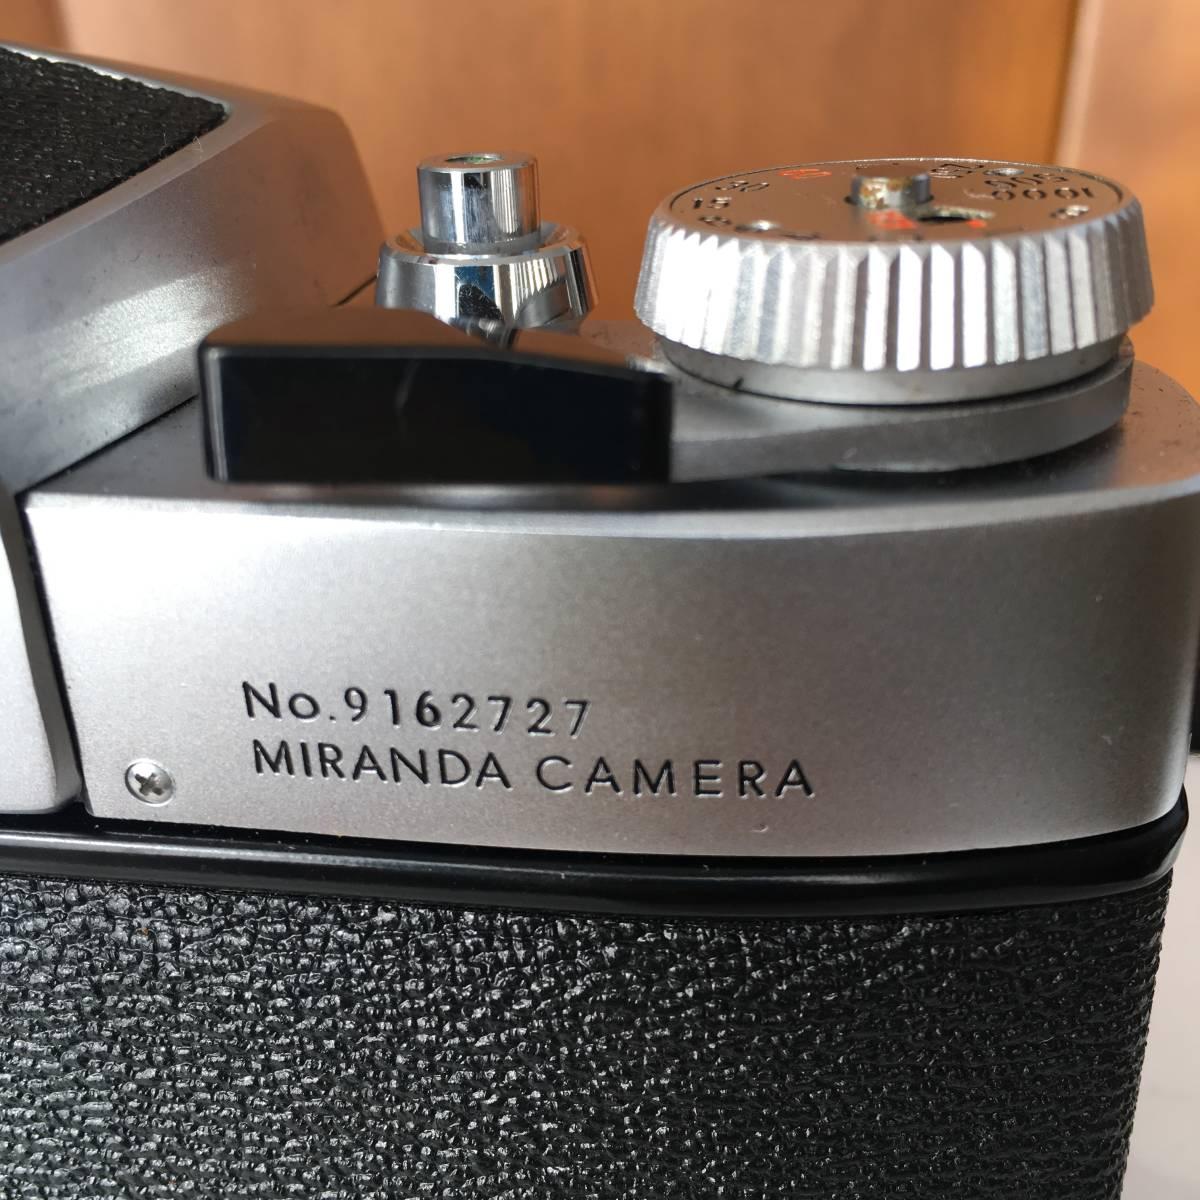 MIRANDA EE AUTO SENSOREX カメラ ボディのみ 中古 ジャンク扱い_画像7